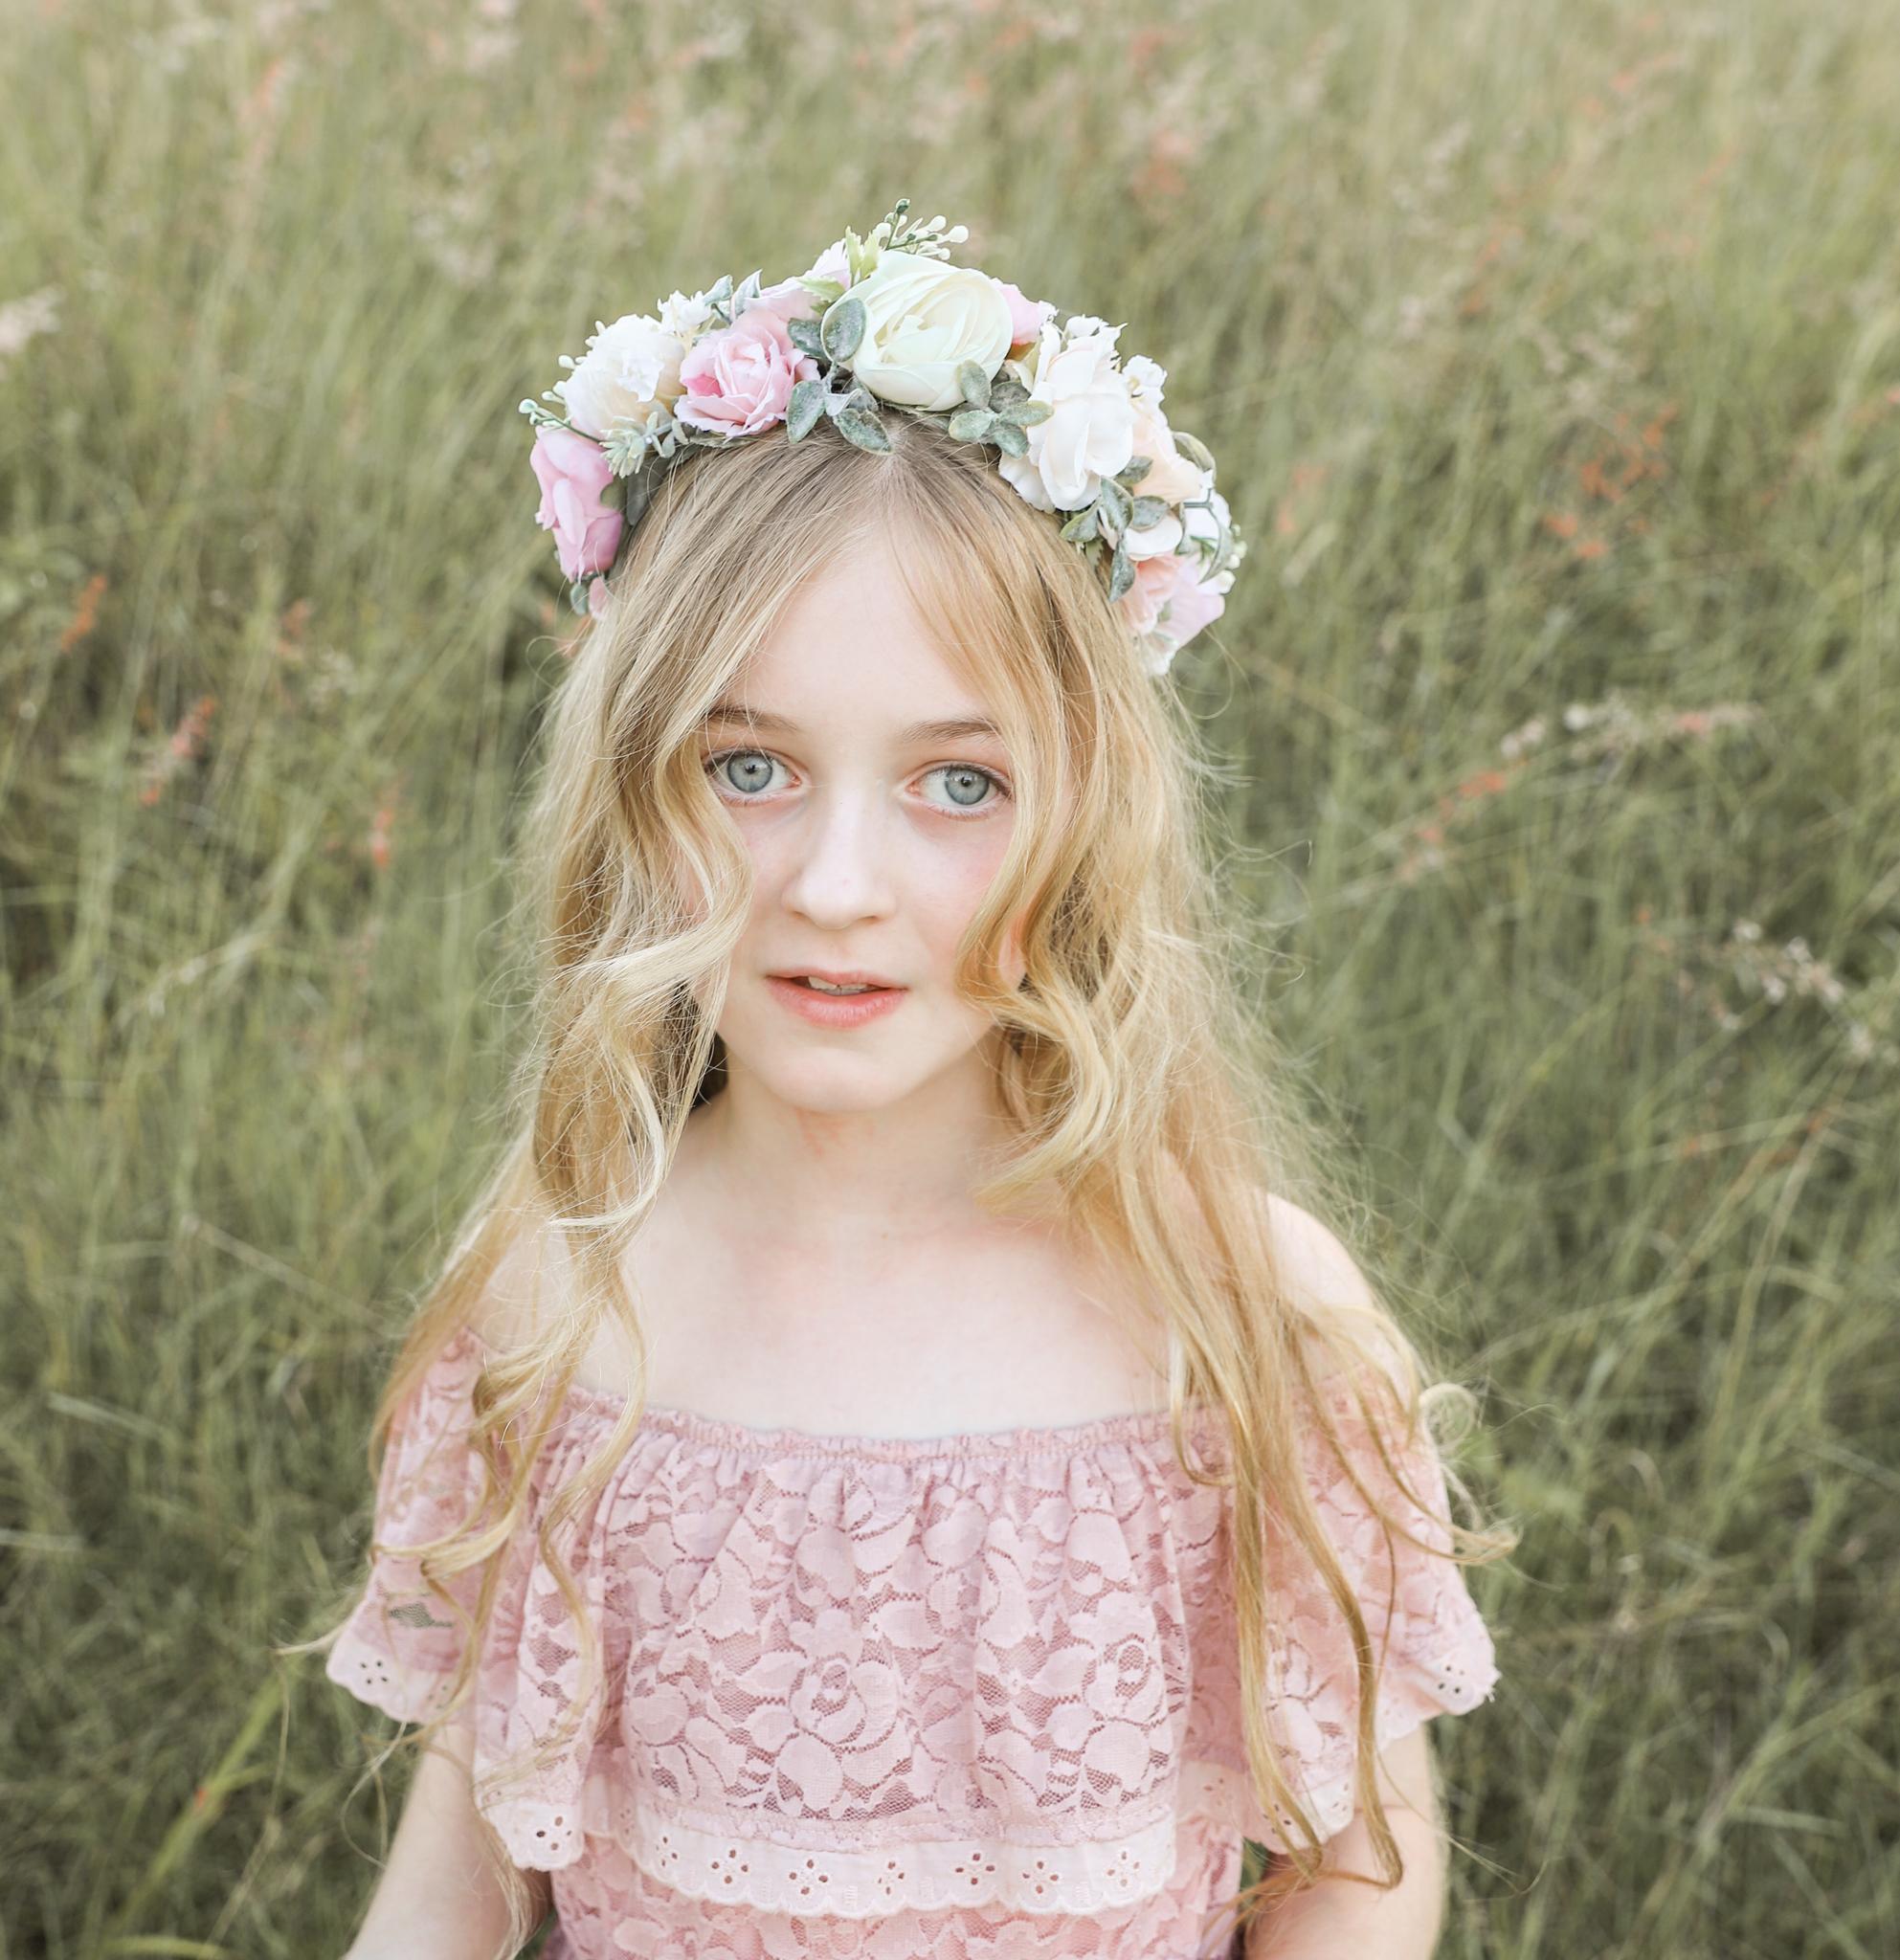 Girls Adeline Pink Rose Flower Crown And Flower Girl Dress